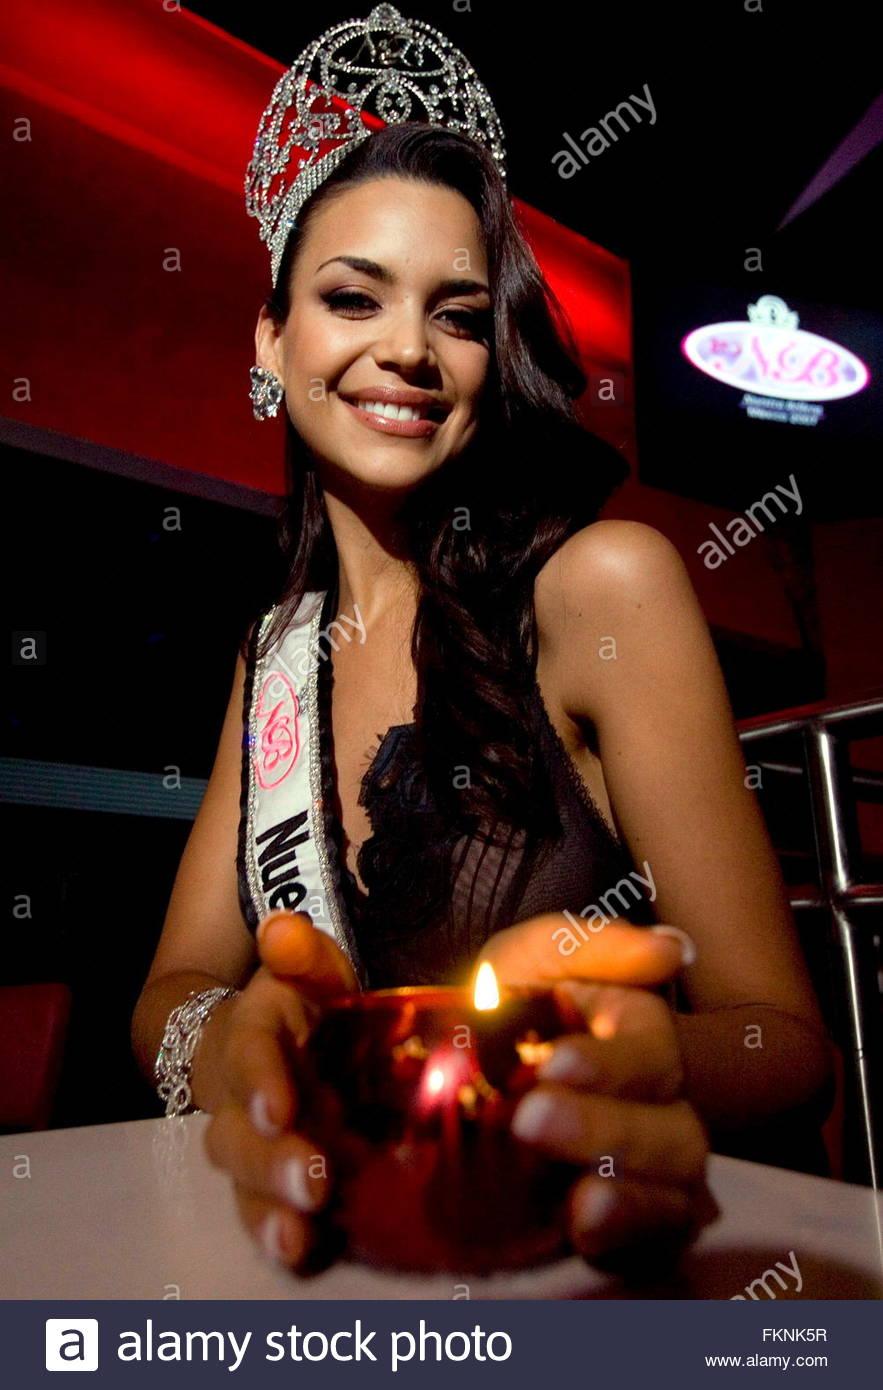 elisa najera, top 5 de miss universe 2008. - Página 4 3nd2bs4r